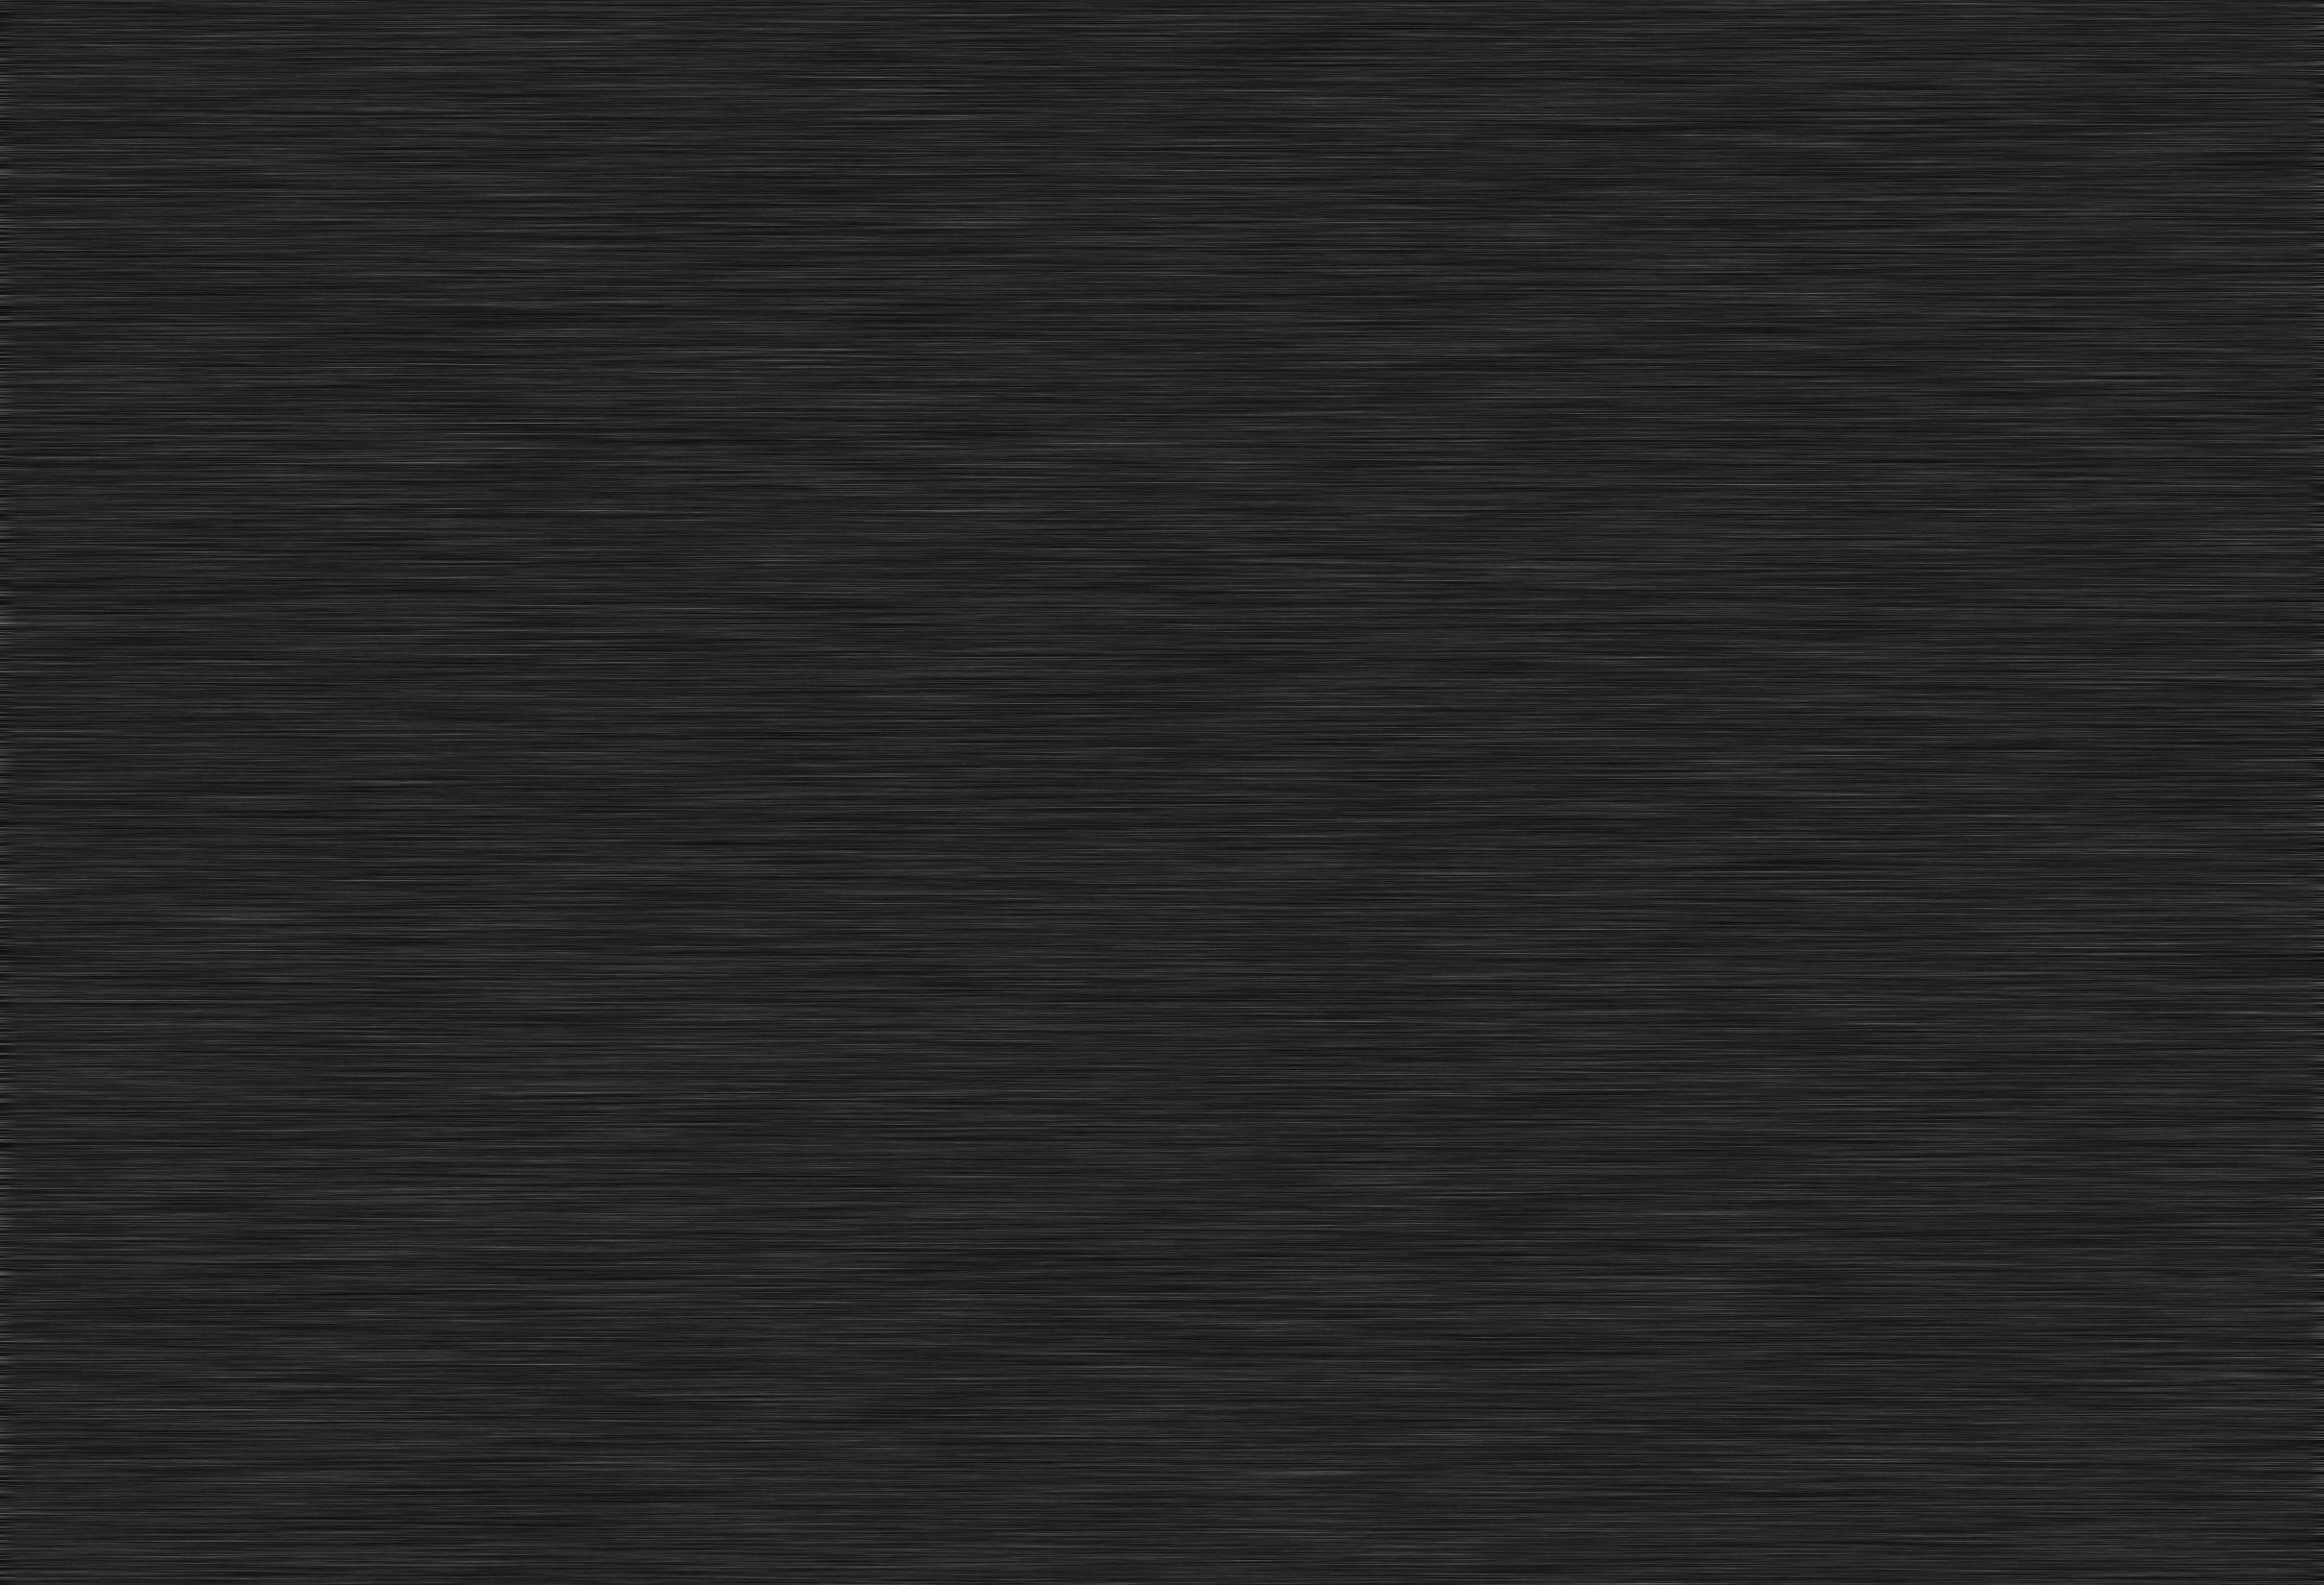 black metal texture by yourpoisontheo on DeviantArt